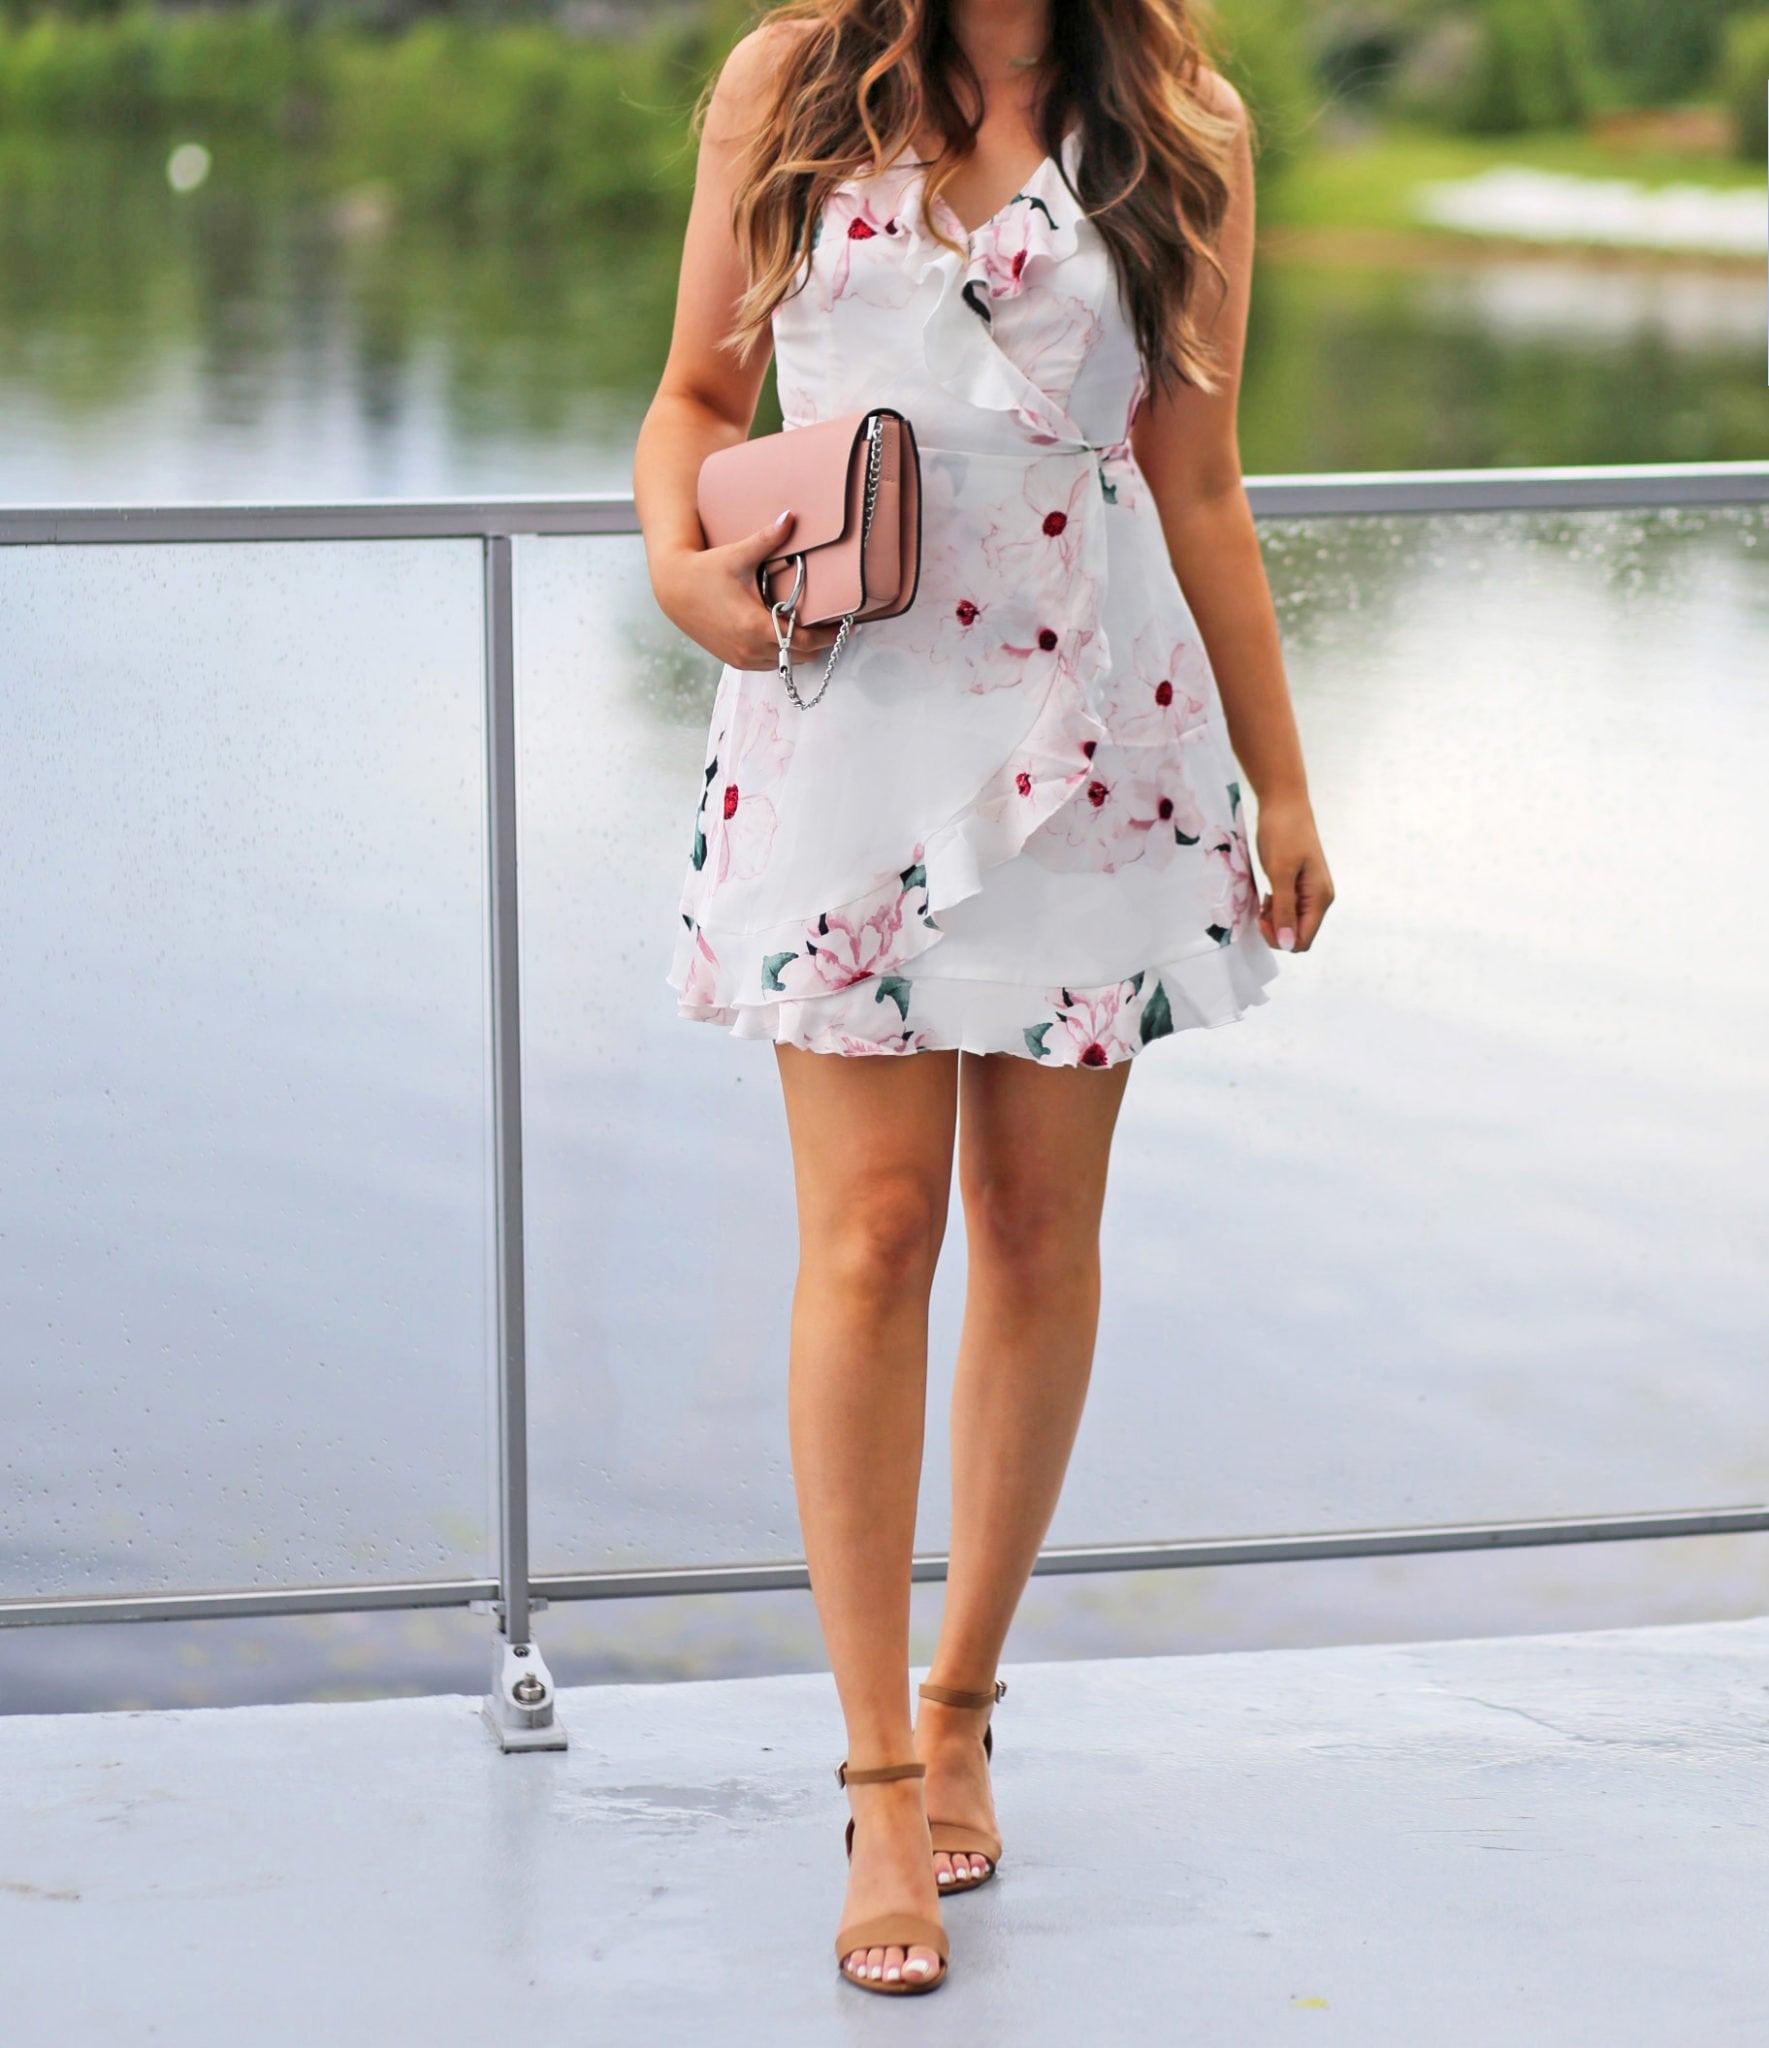 floral ruffle dress   summer outfit   beauty blogger Mash Elle   floral outfit   summer dress   sundress   pool dress   summer party   vacation dress  pink clutch